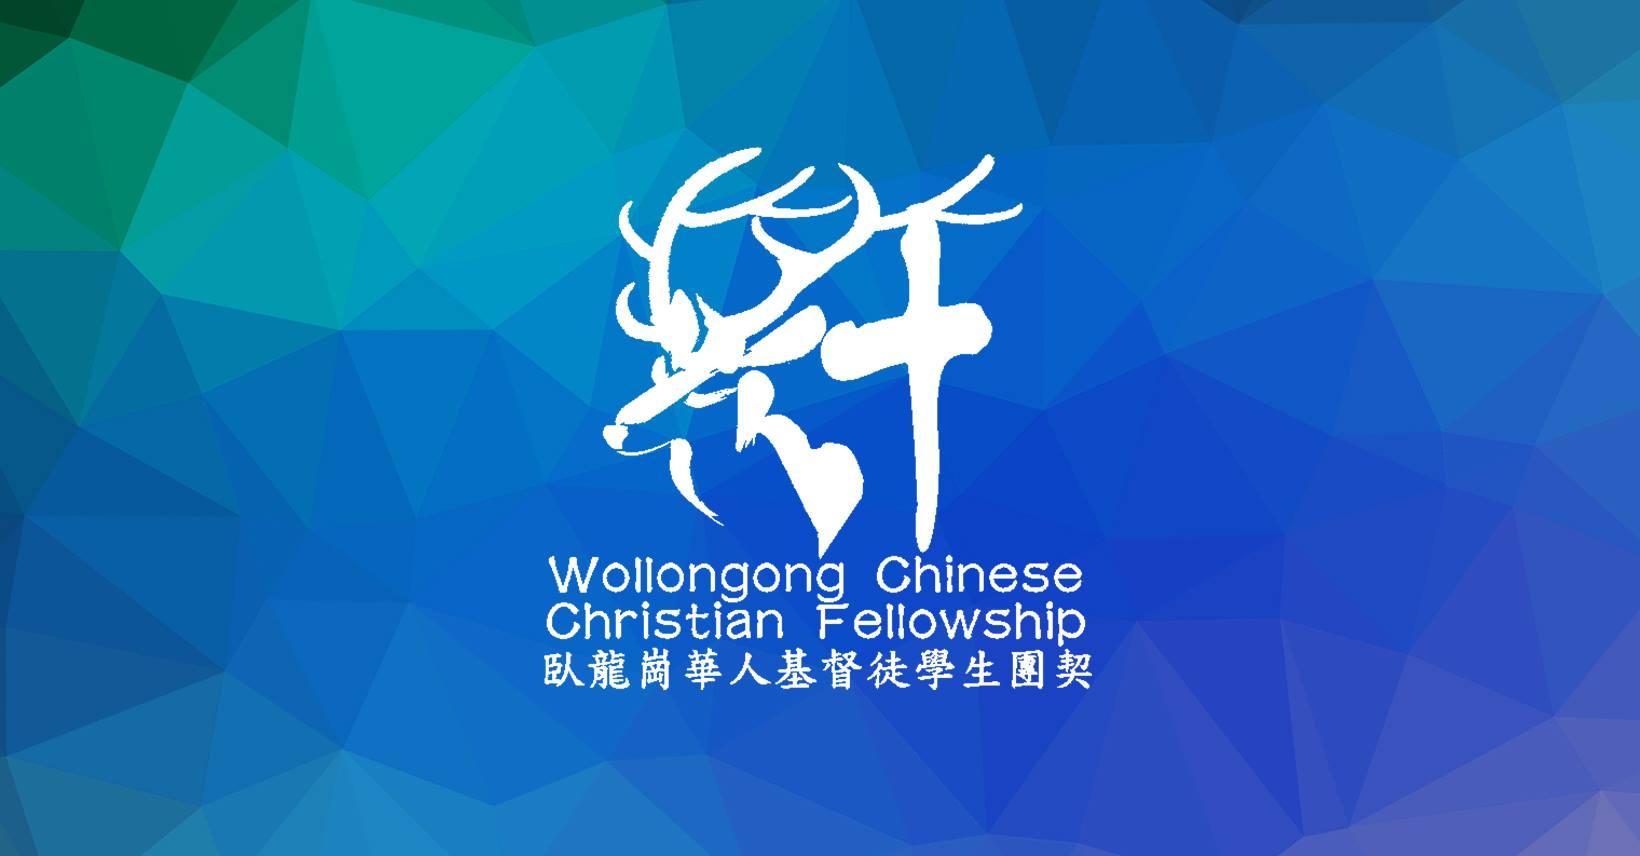 UniClubs - UOW Chinese Christian Fellowship Logo